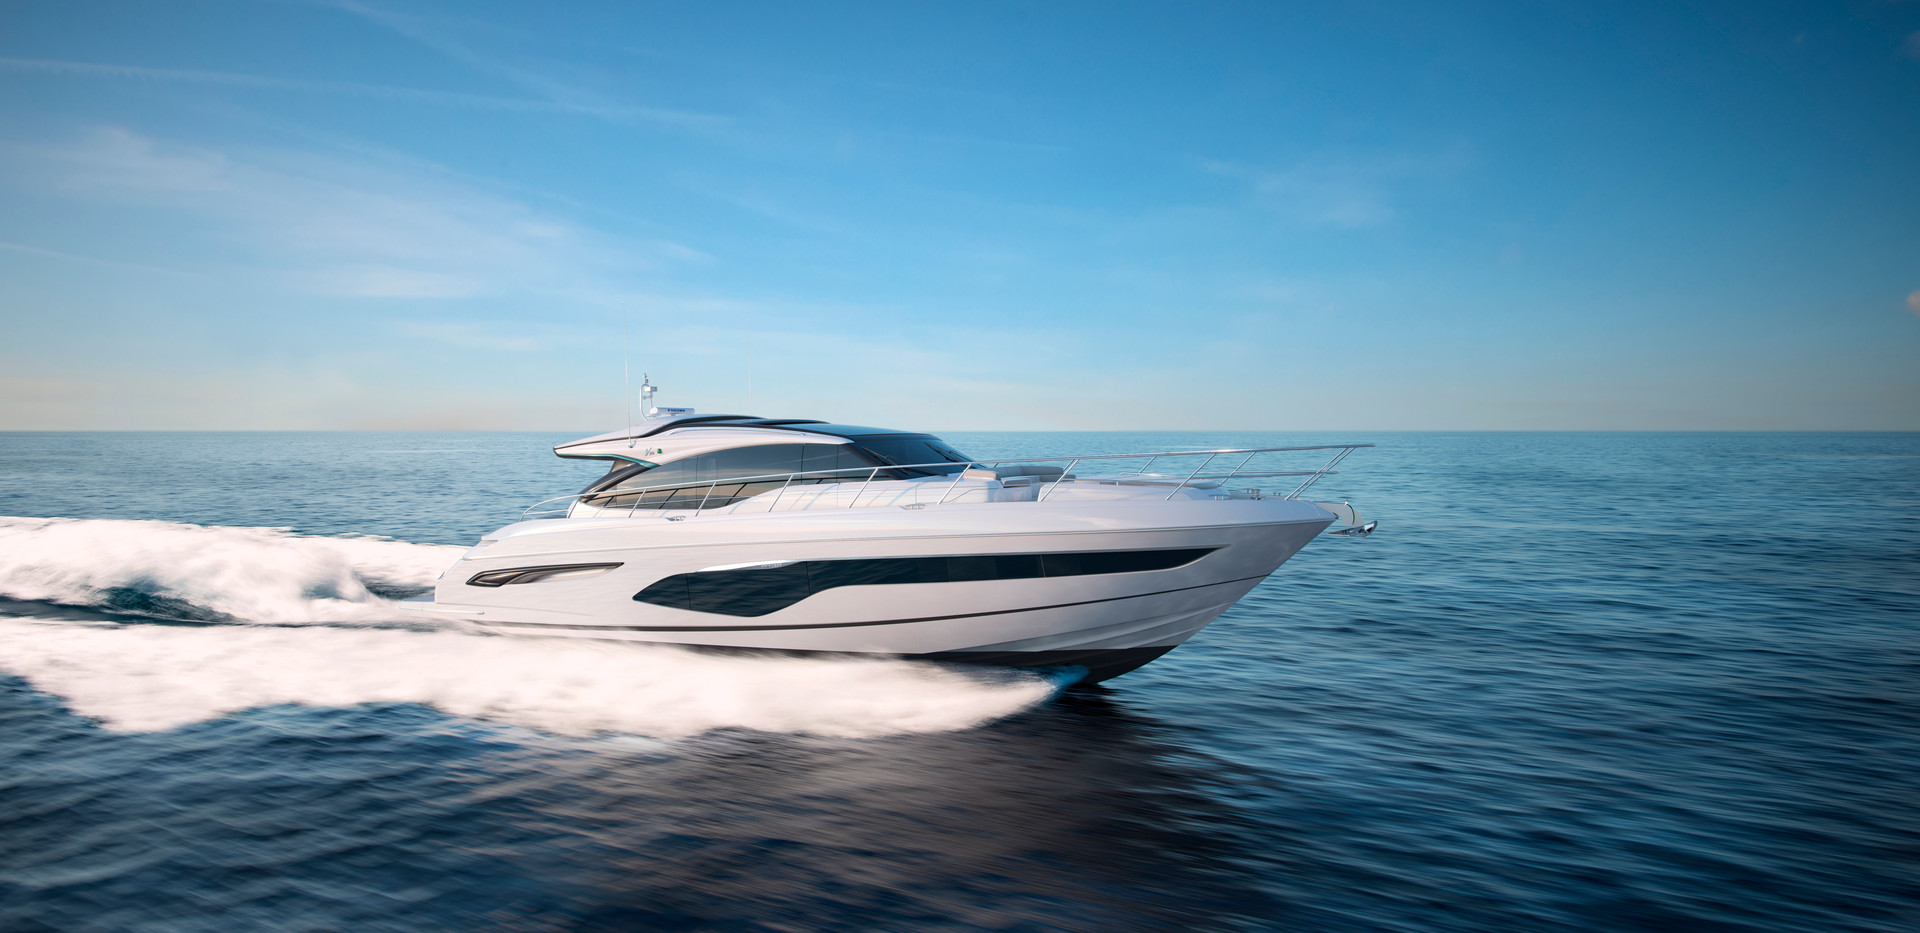 v65-exterior-white-hull-cgiAbromowitz Sh